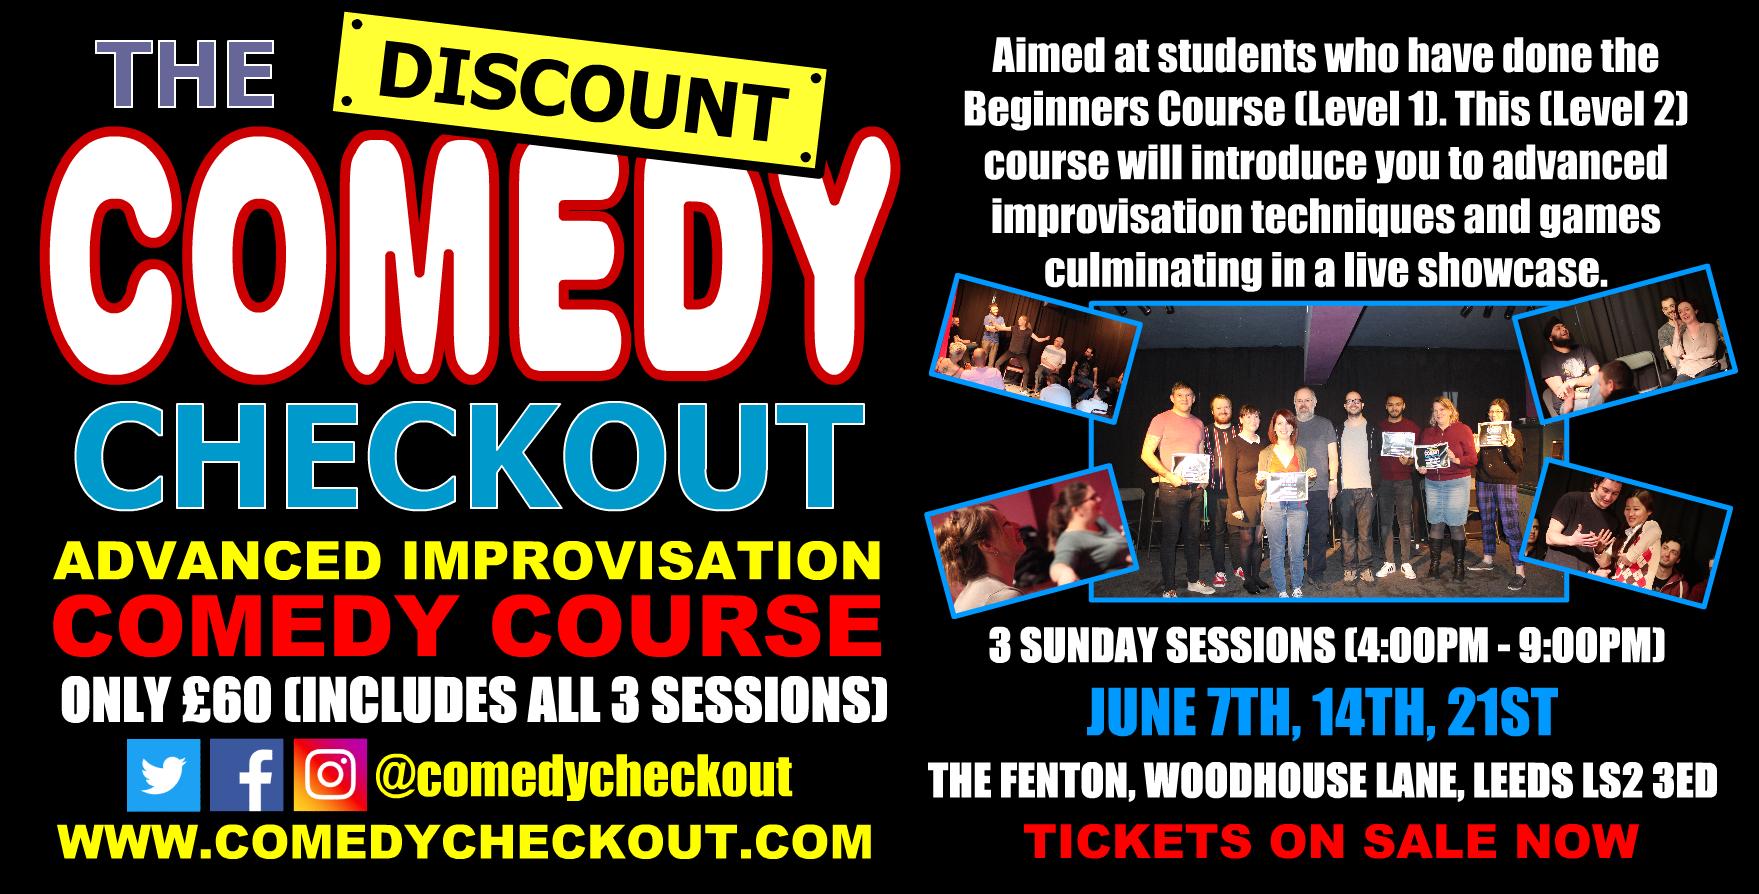 DCC - Advanced Improvisation Comedy Course - June - Leeds (3 Sundays)